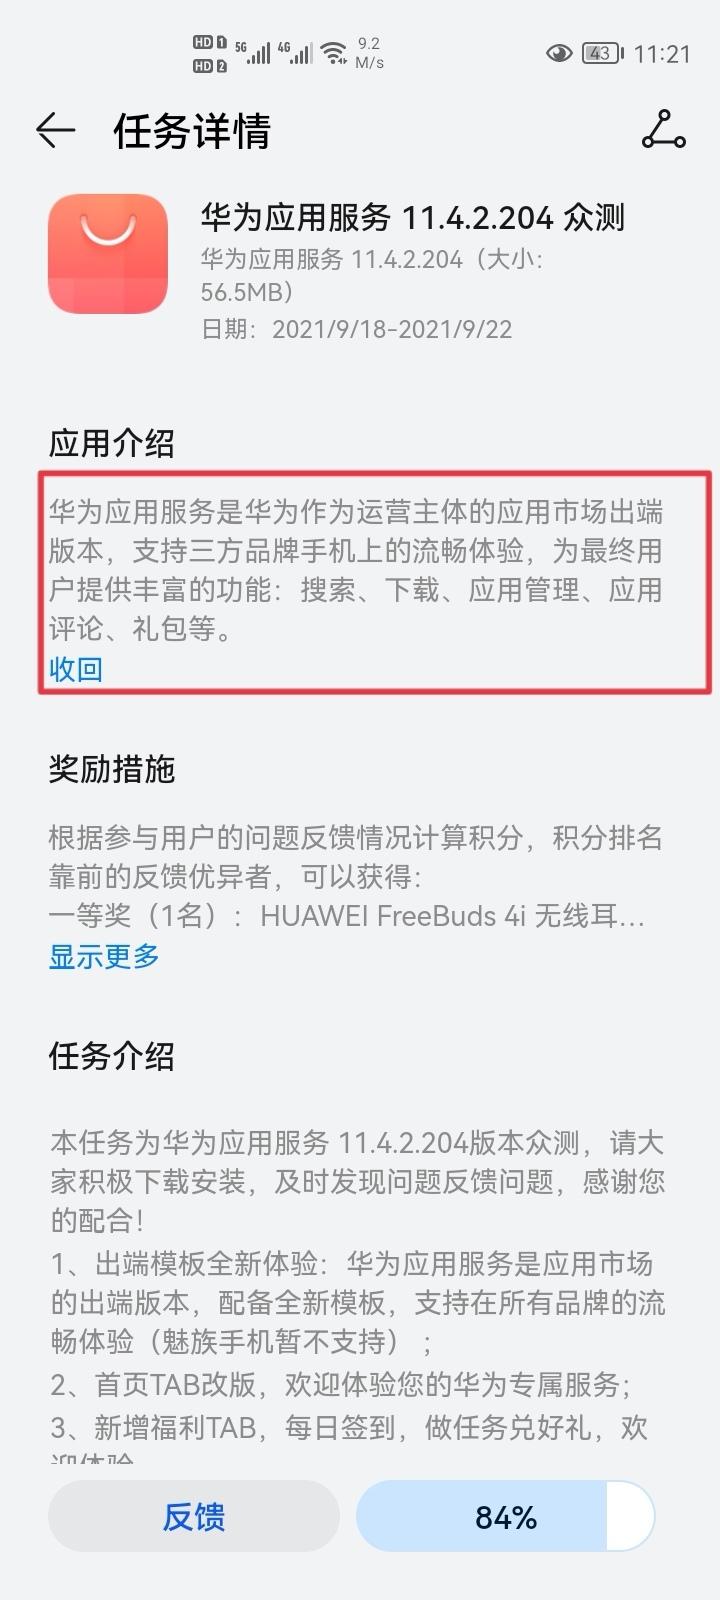 Screenshot_20210920_232139_com.huawei.mycenter_edit_503273948404976.jpg